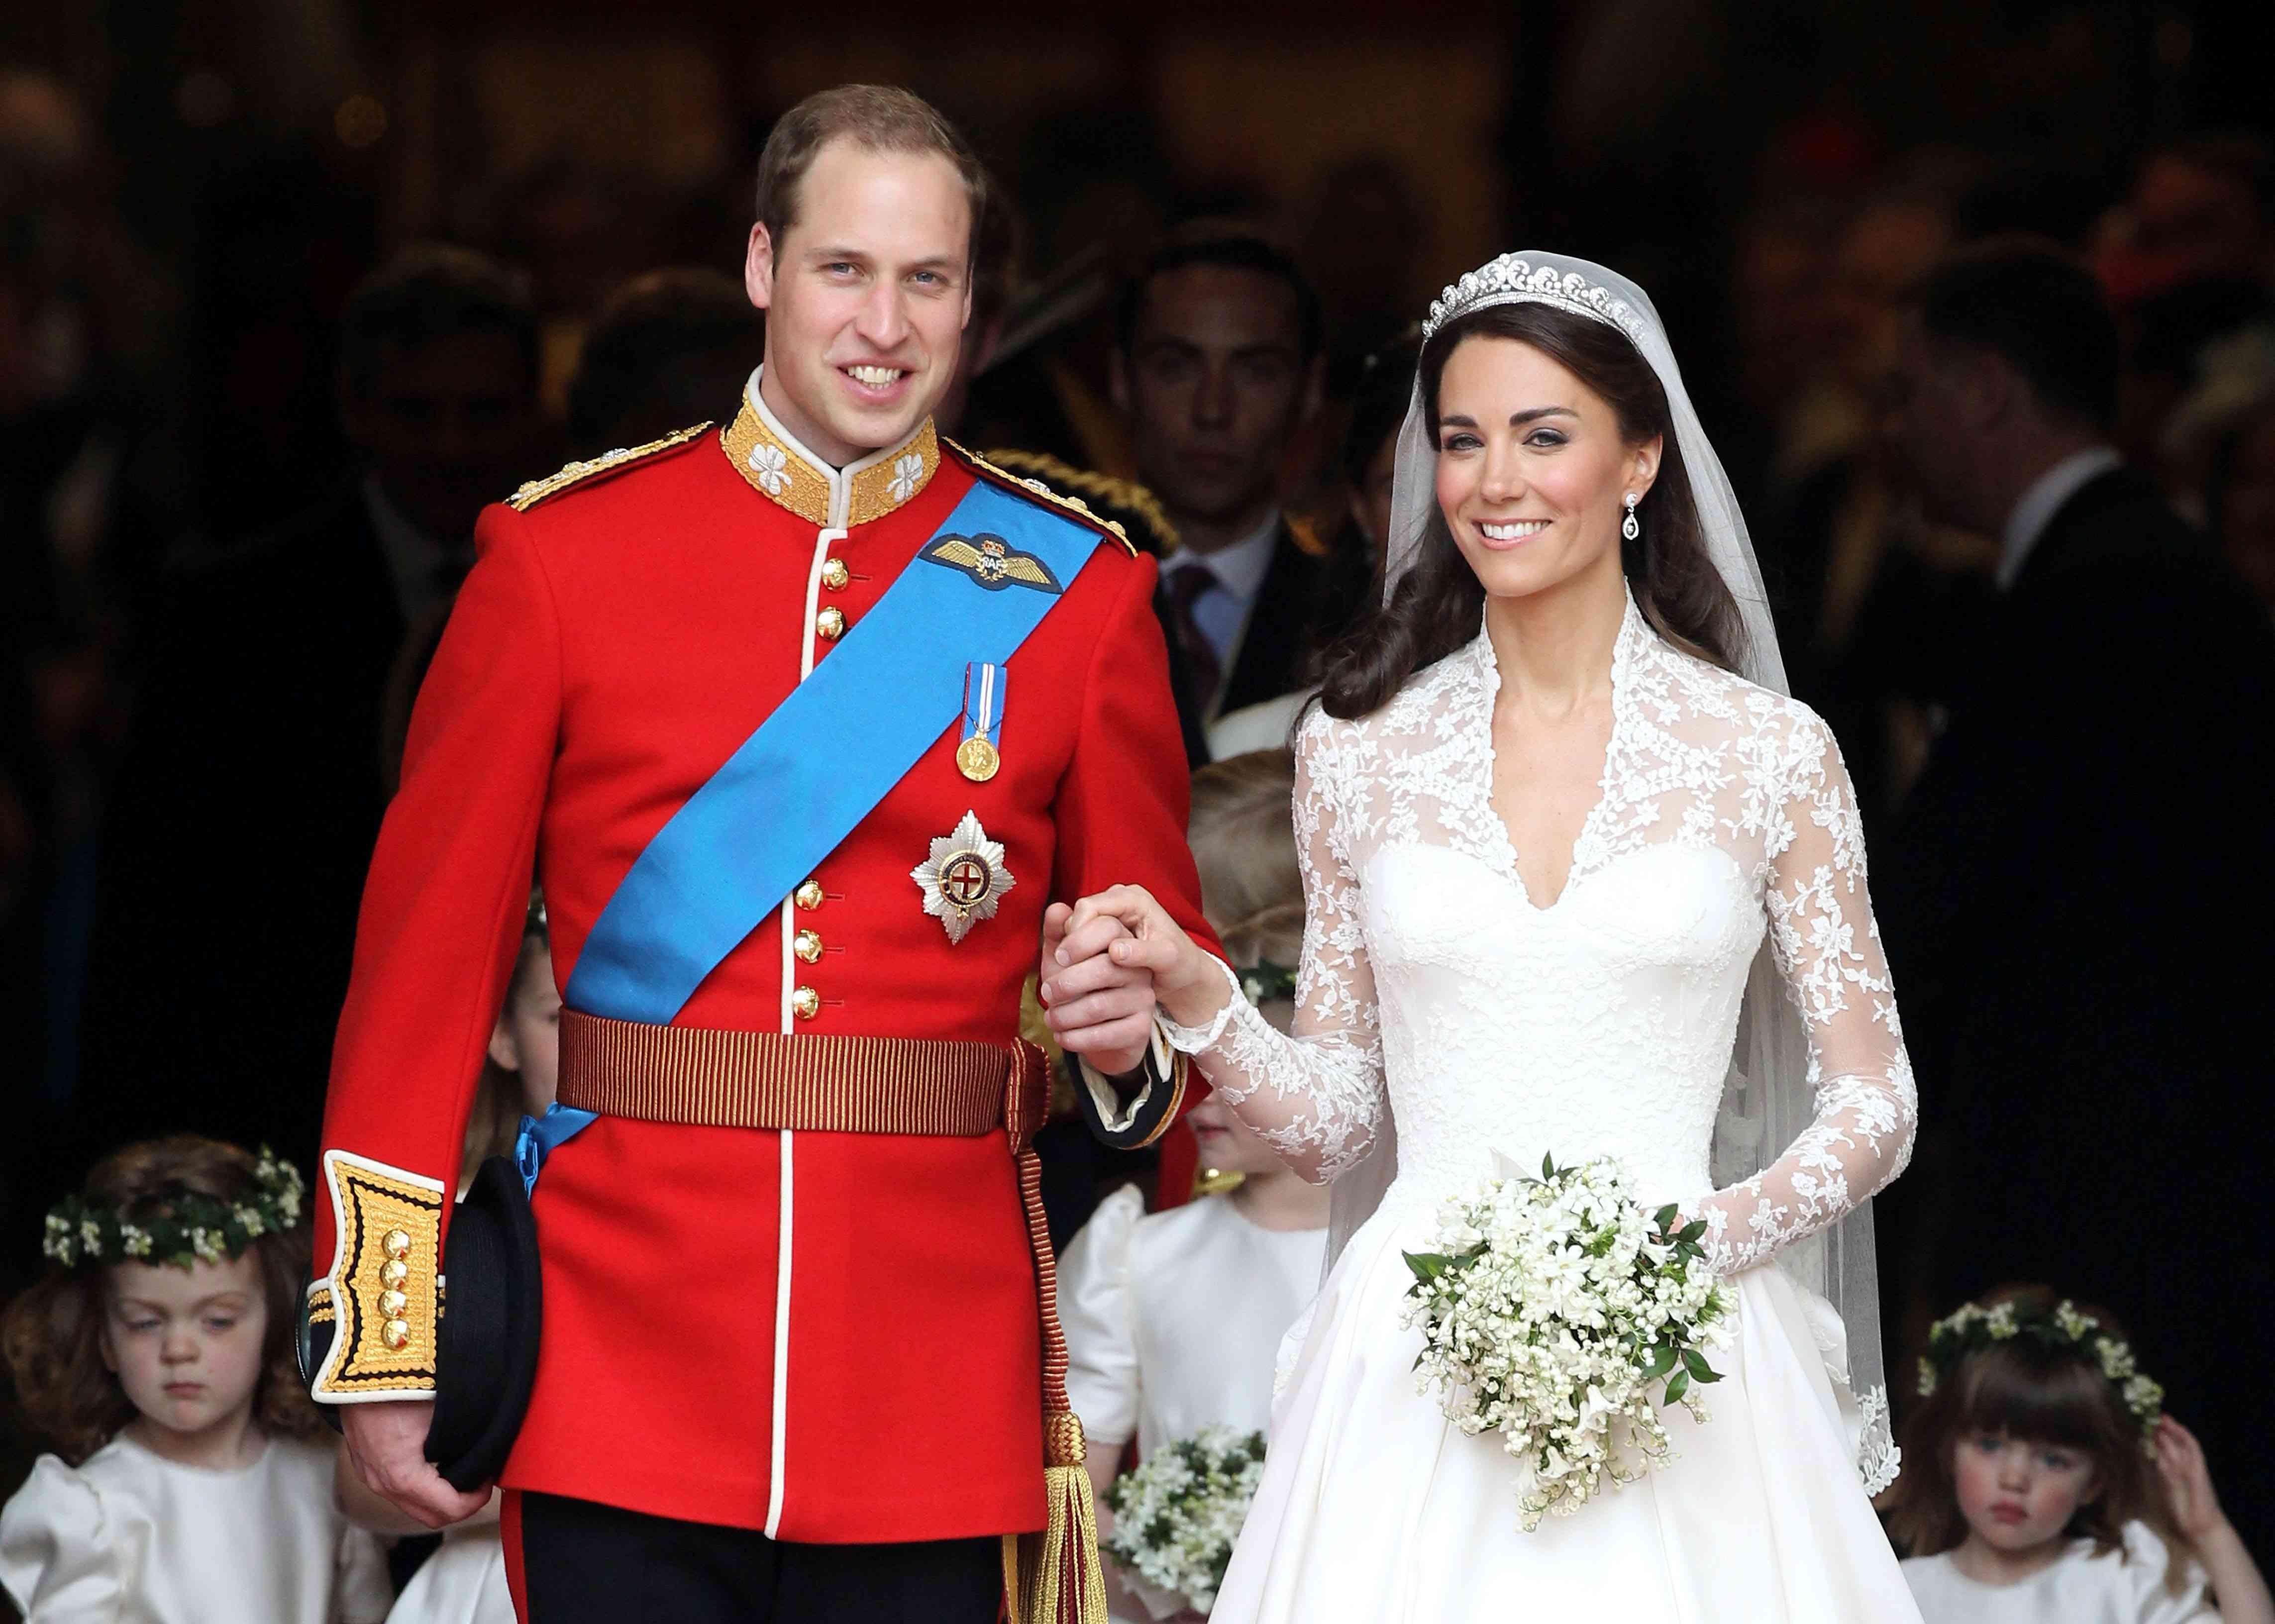 Prince William and Kate Wedding Anniversary